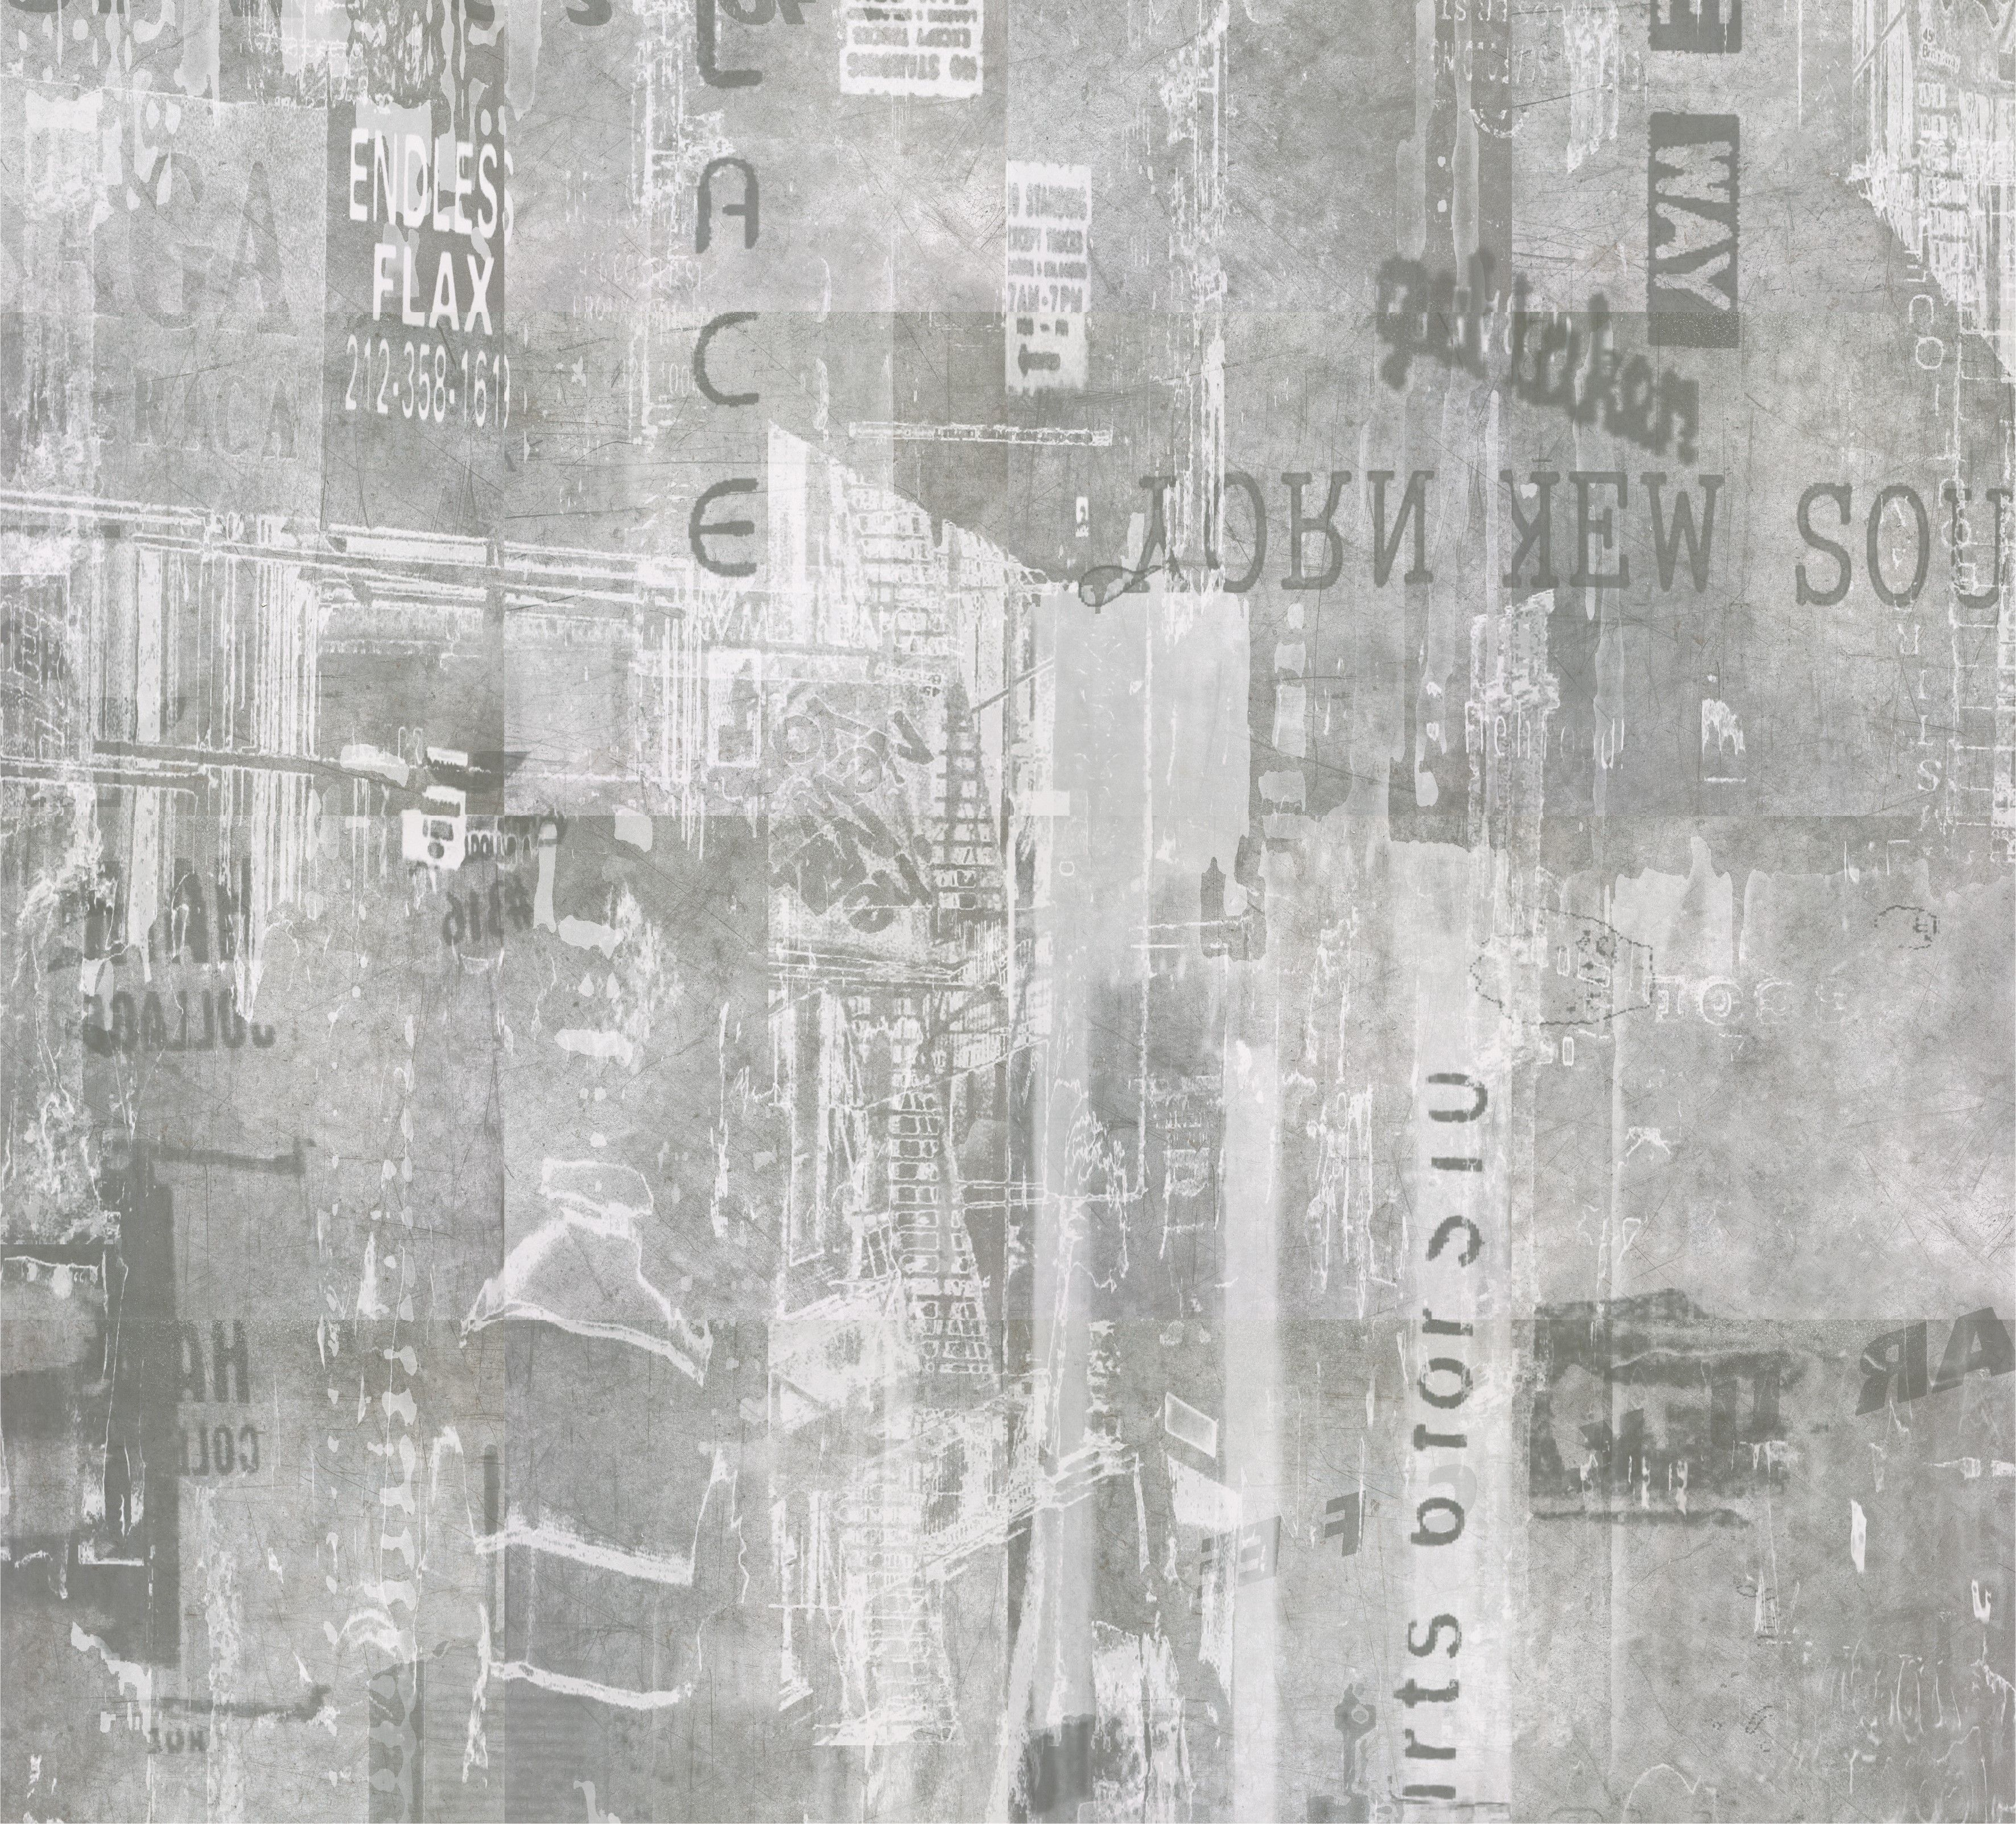 Graffiti wall tiles - Graffiti Tile Porcelain 600x600 Combination By Urban Edge Ceramics